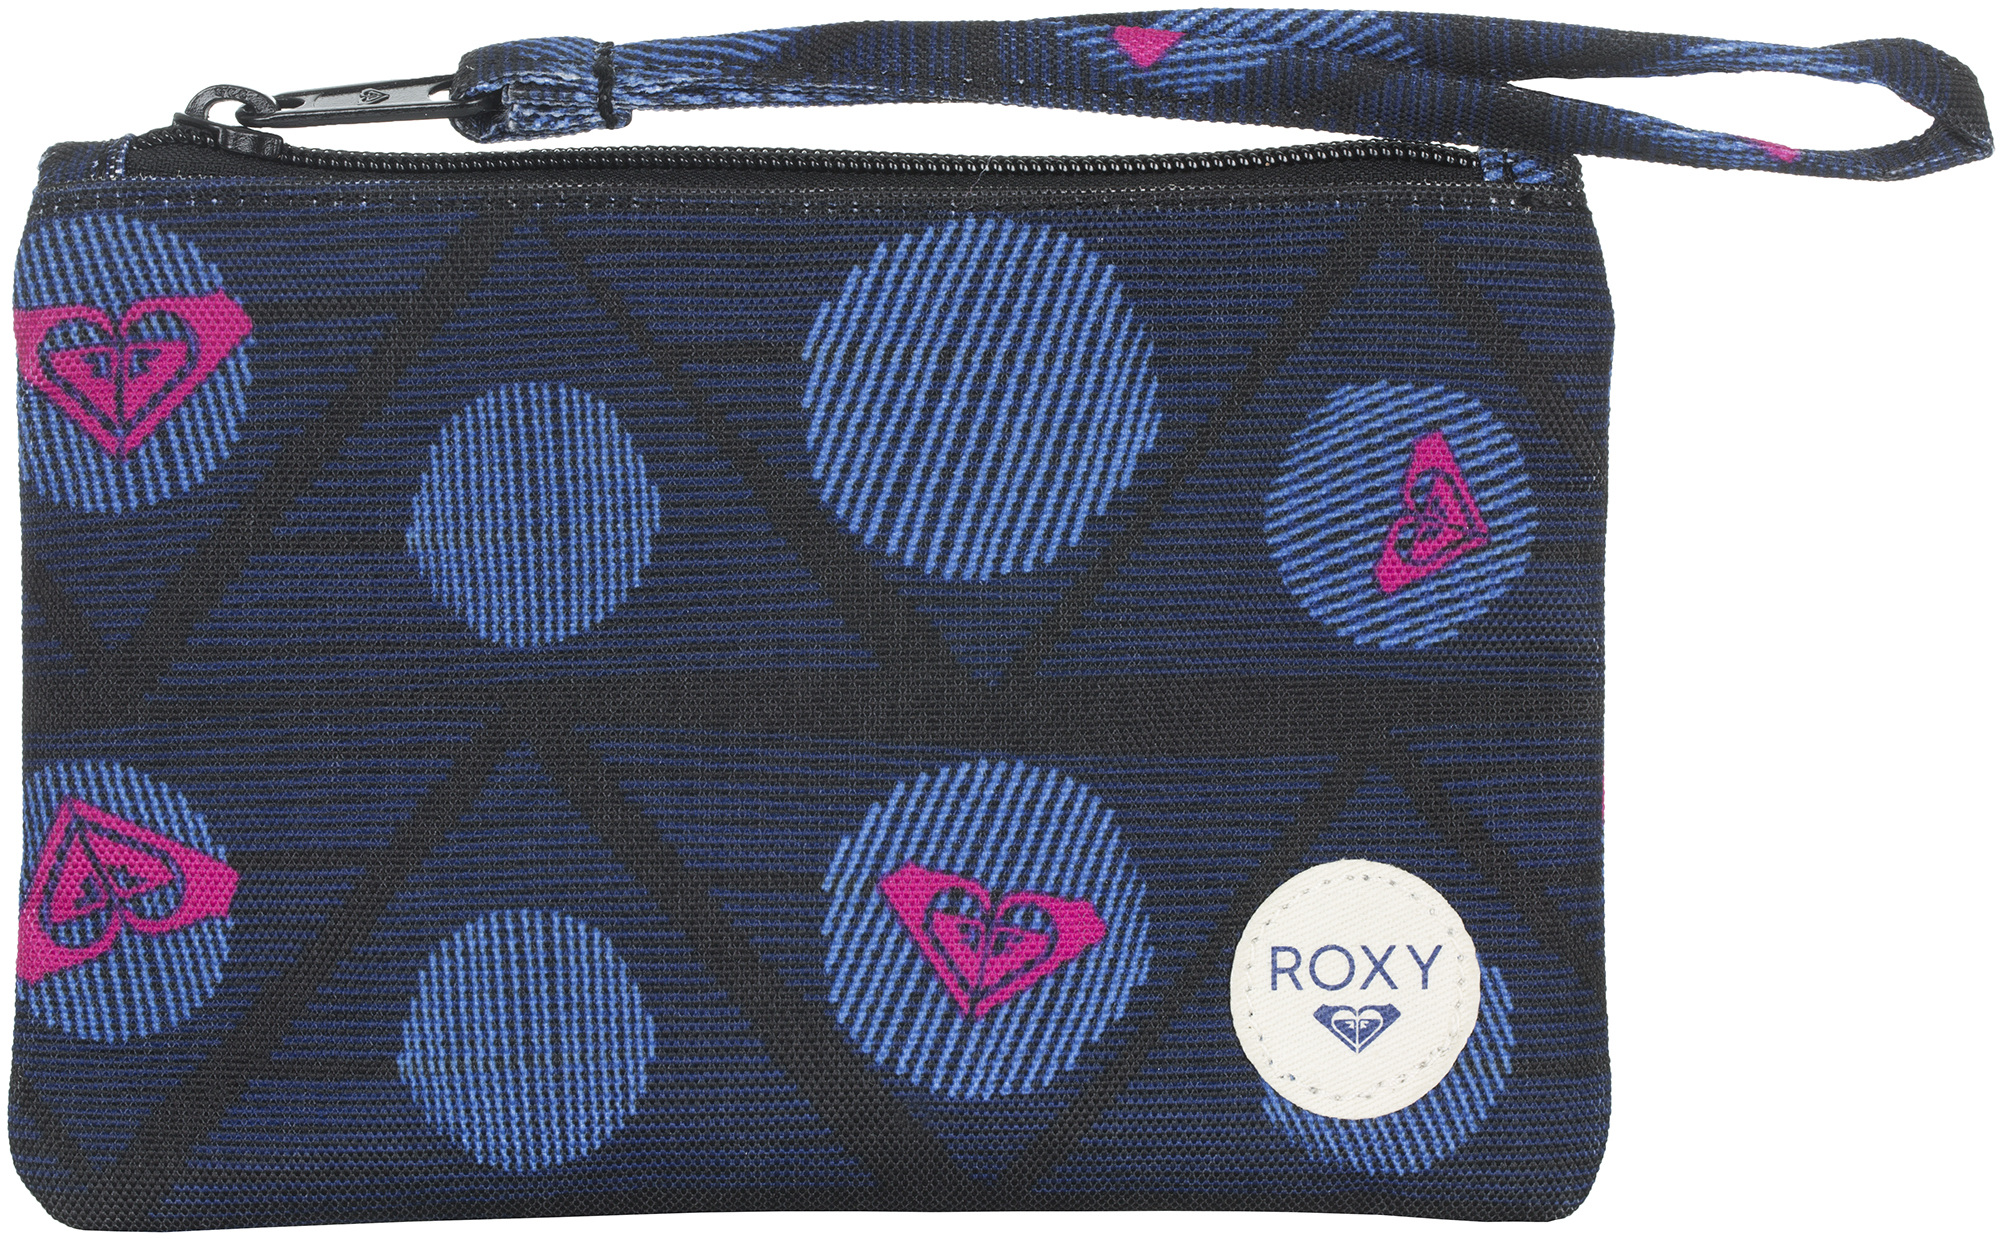 Roxy Косметичка женская Roxy косметичка женская roxy to the beach j wllt ikat pattern new com